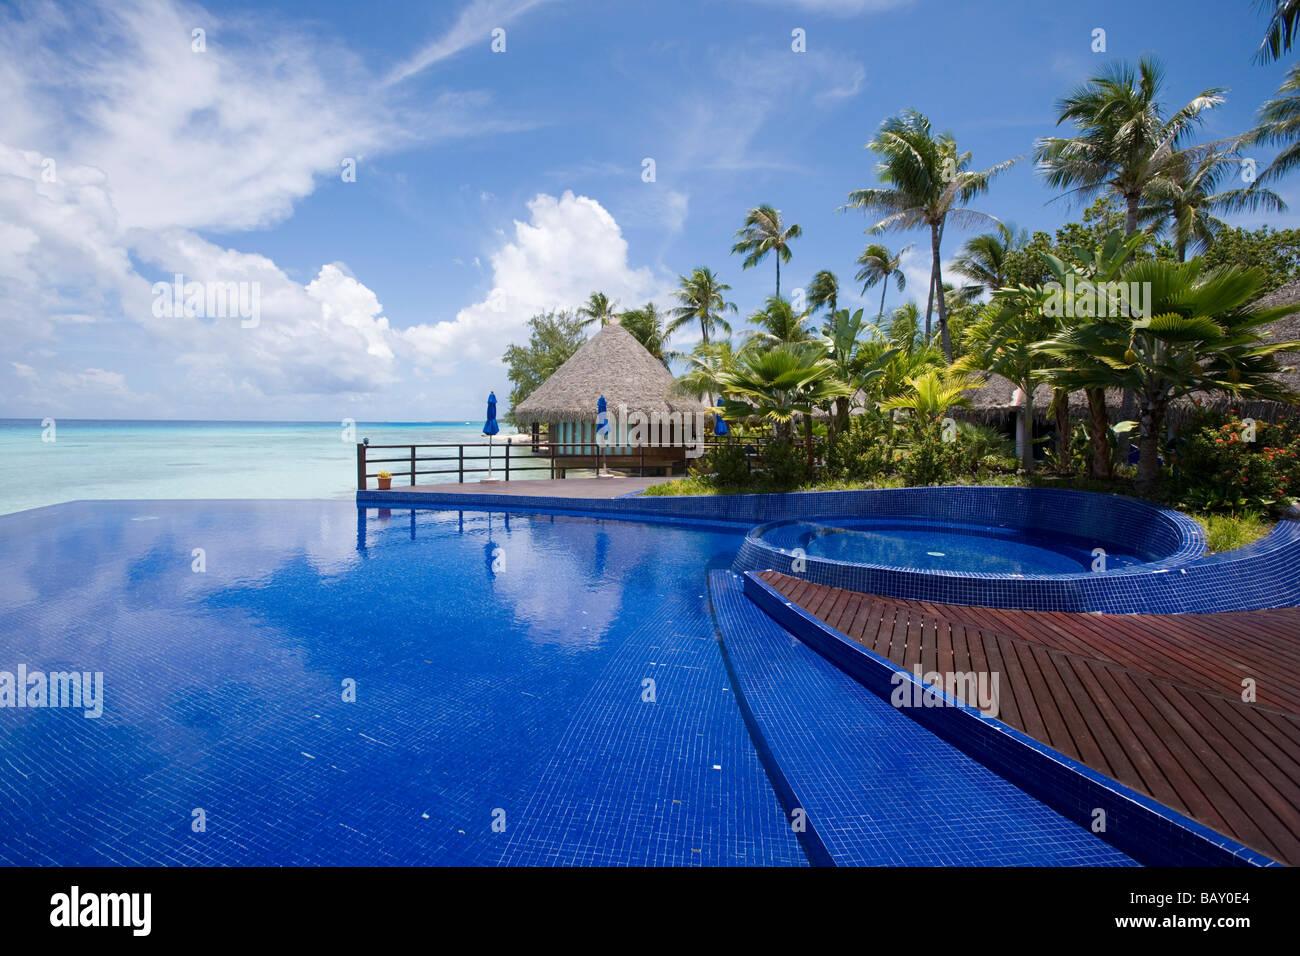 Swimming Pool Of Hotel Kia Ora Avatoru Rangiroa The Tuamotus Stock Photo Royalty Free Image